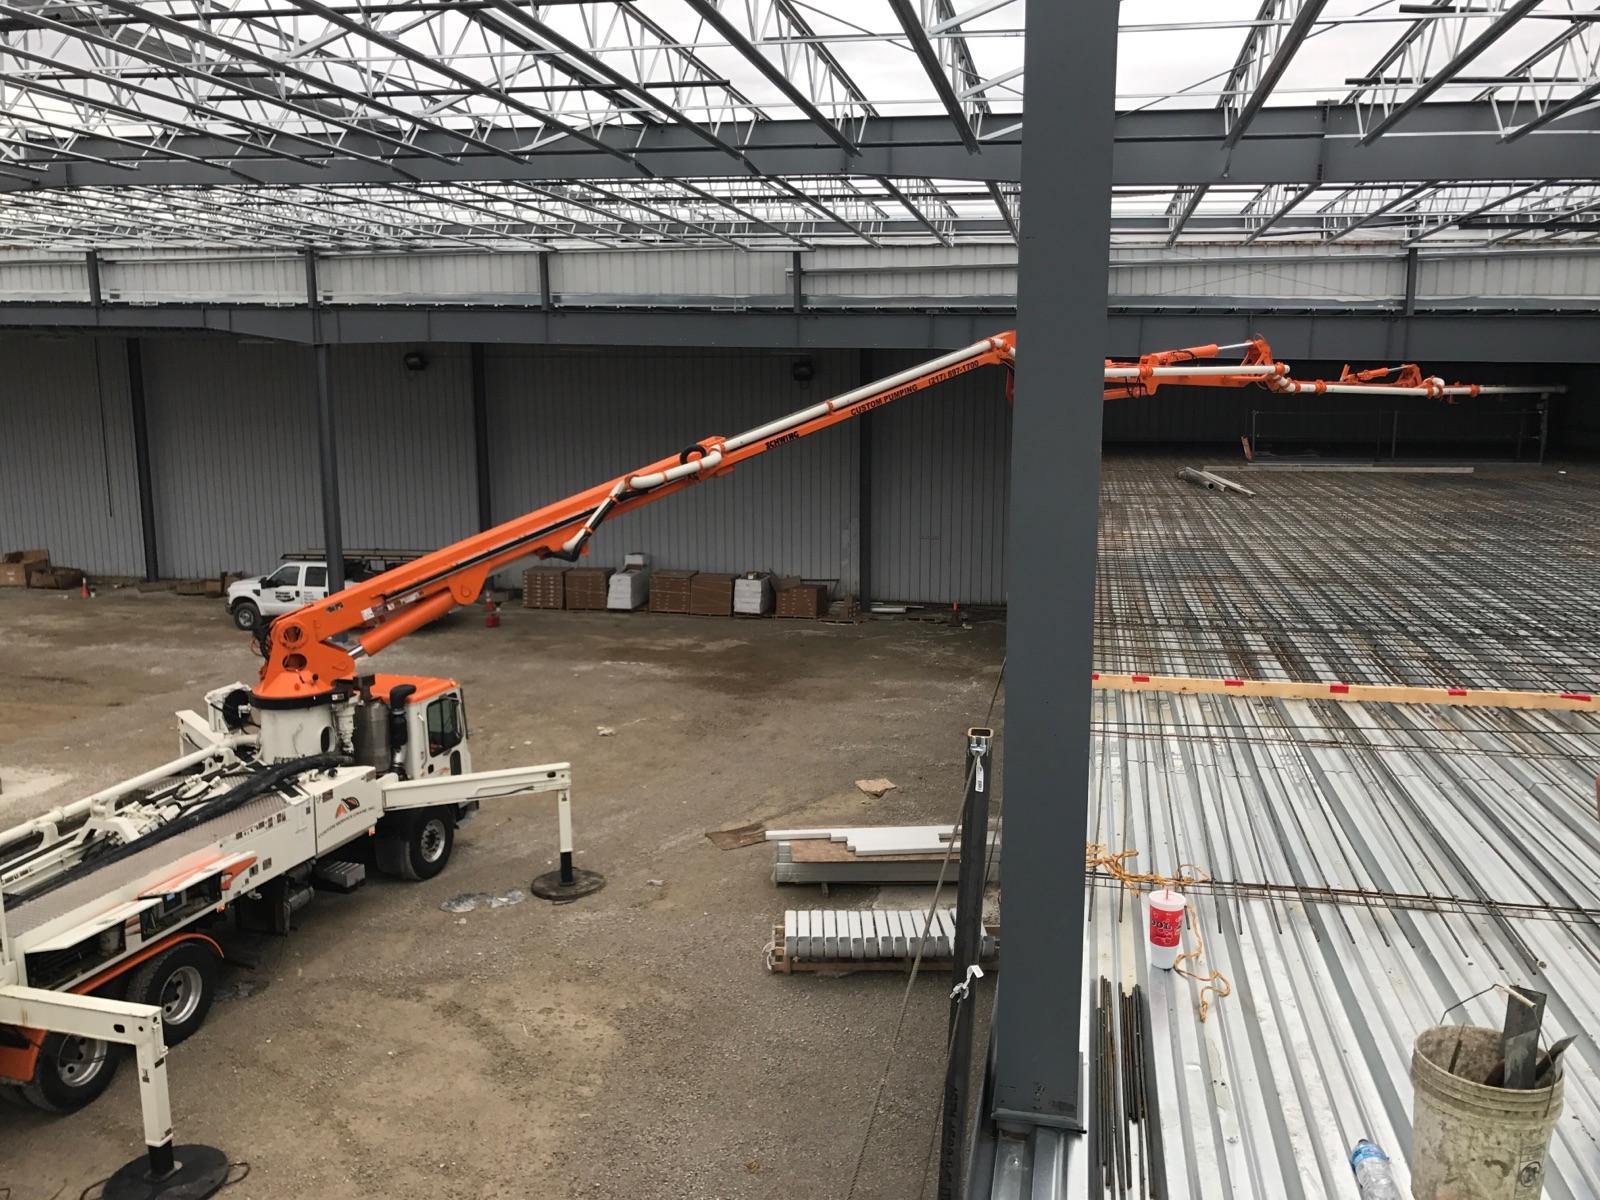 31 meter Z-boom metal deck pour in Danville, IL.